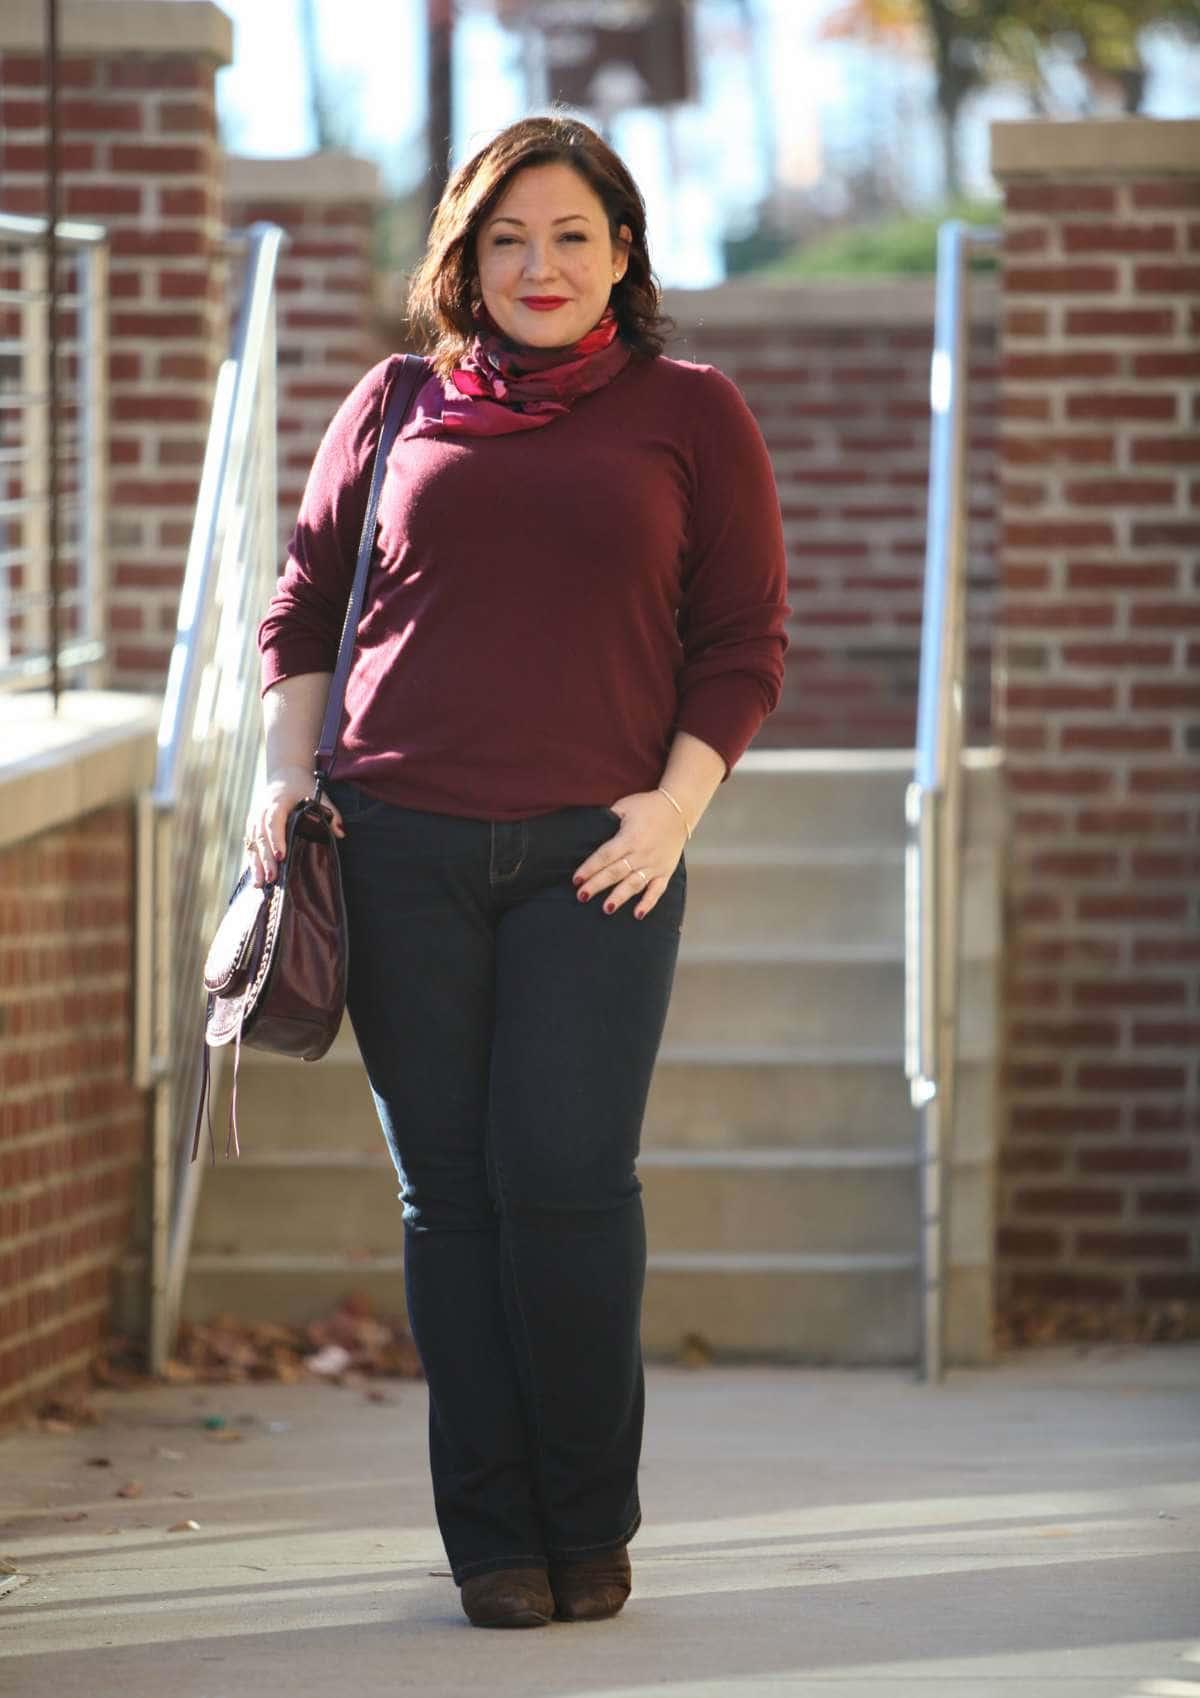 wardrobe-oxygen-size-14-over-40-blogger